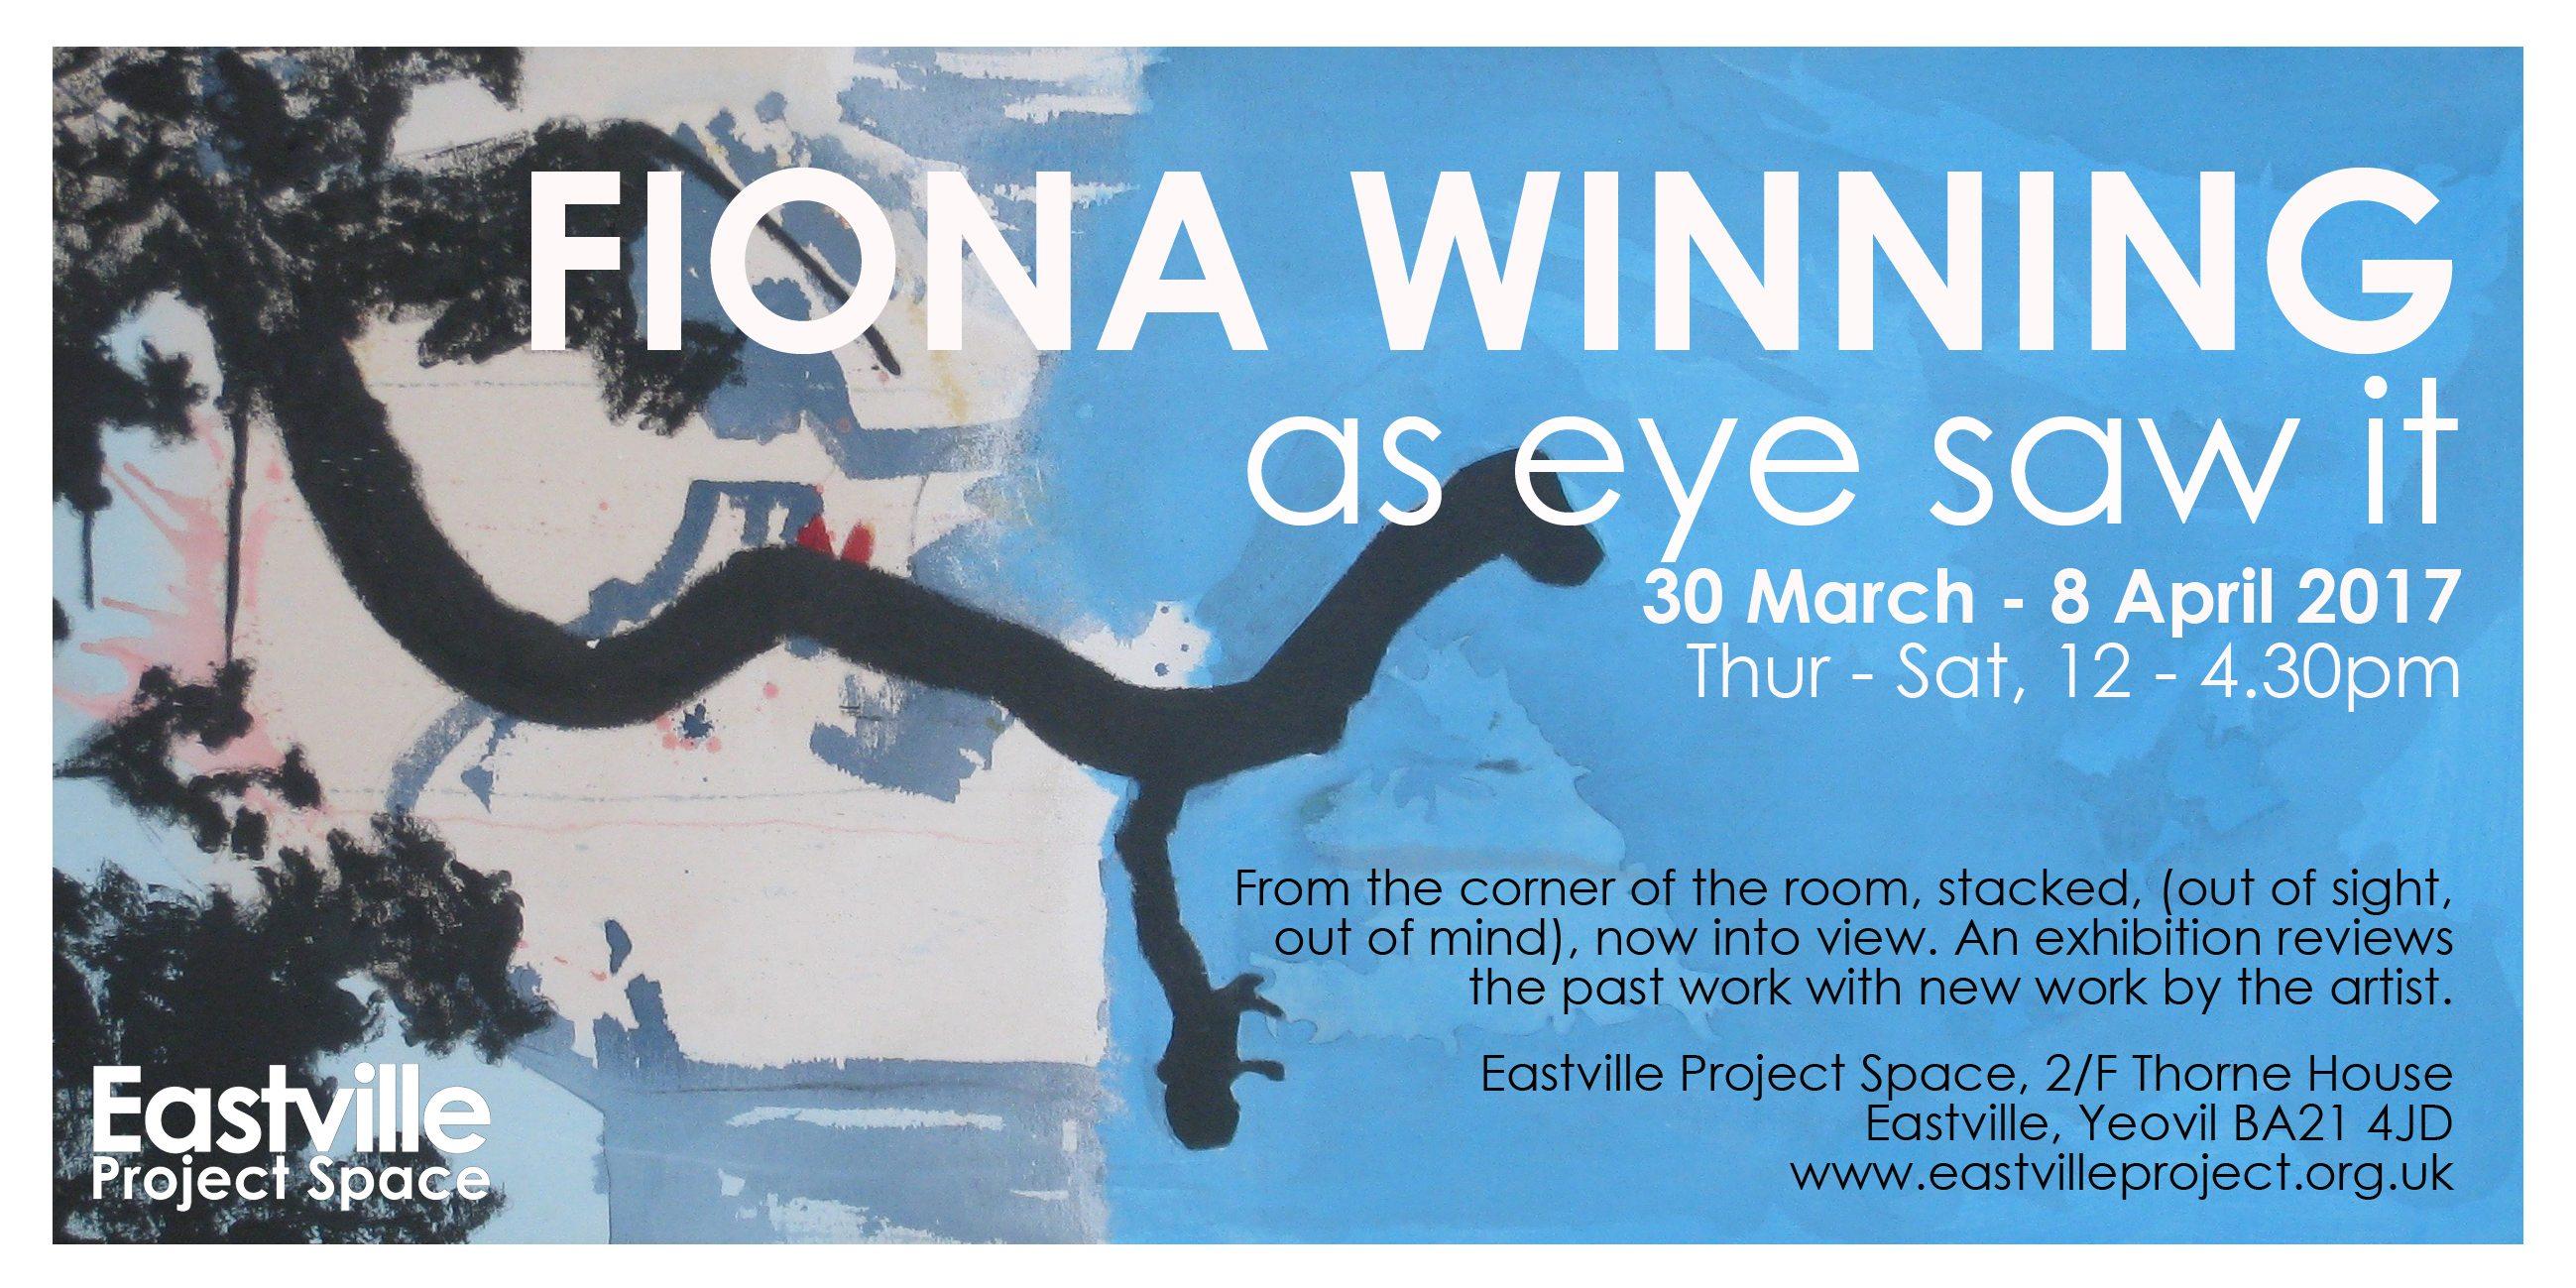 fiona_winning_invite_final